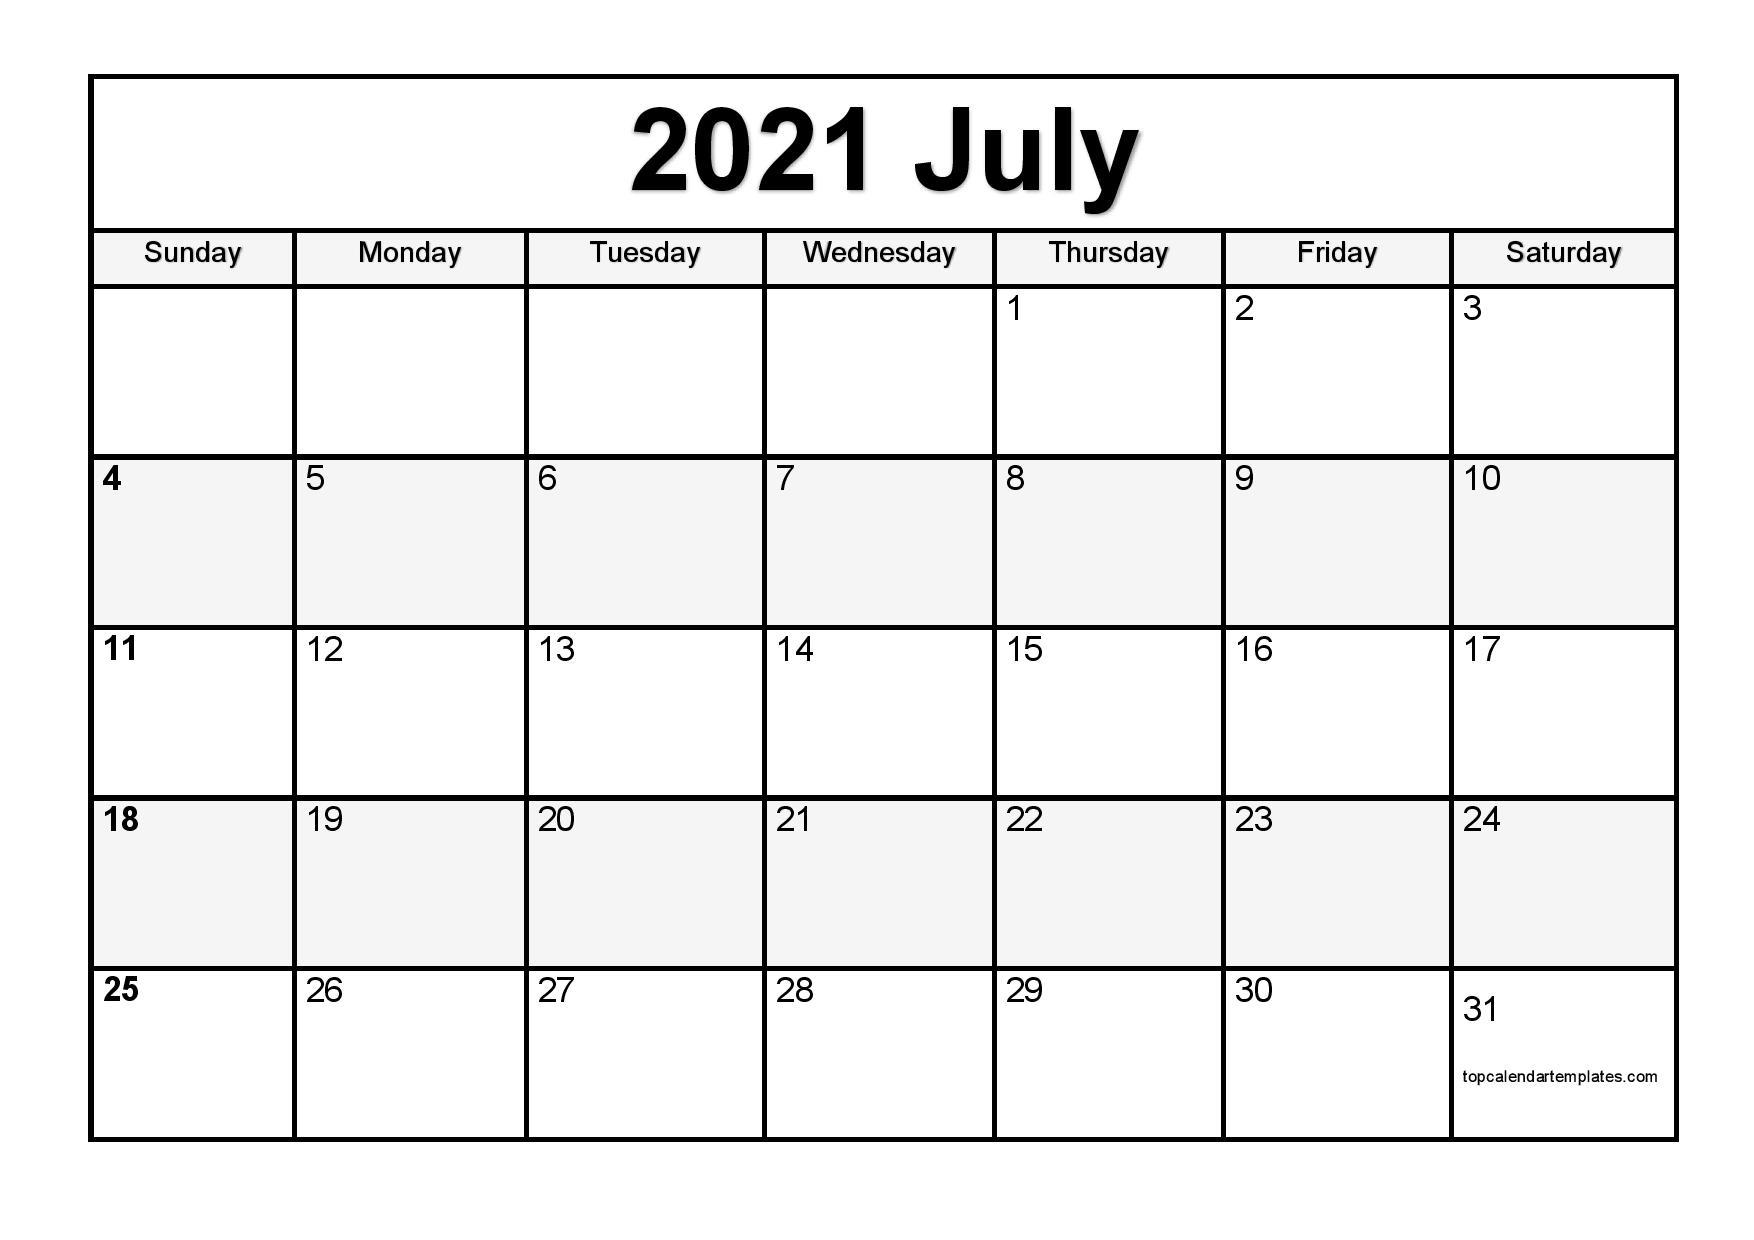 Printable July 2021 Calendar Template  Pdf, Word, Excel intended for 2021 Word Calendar Wincalendar